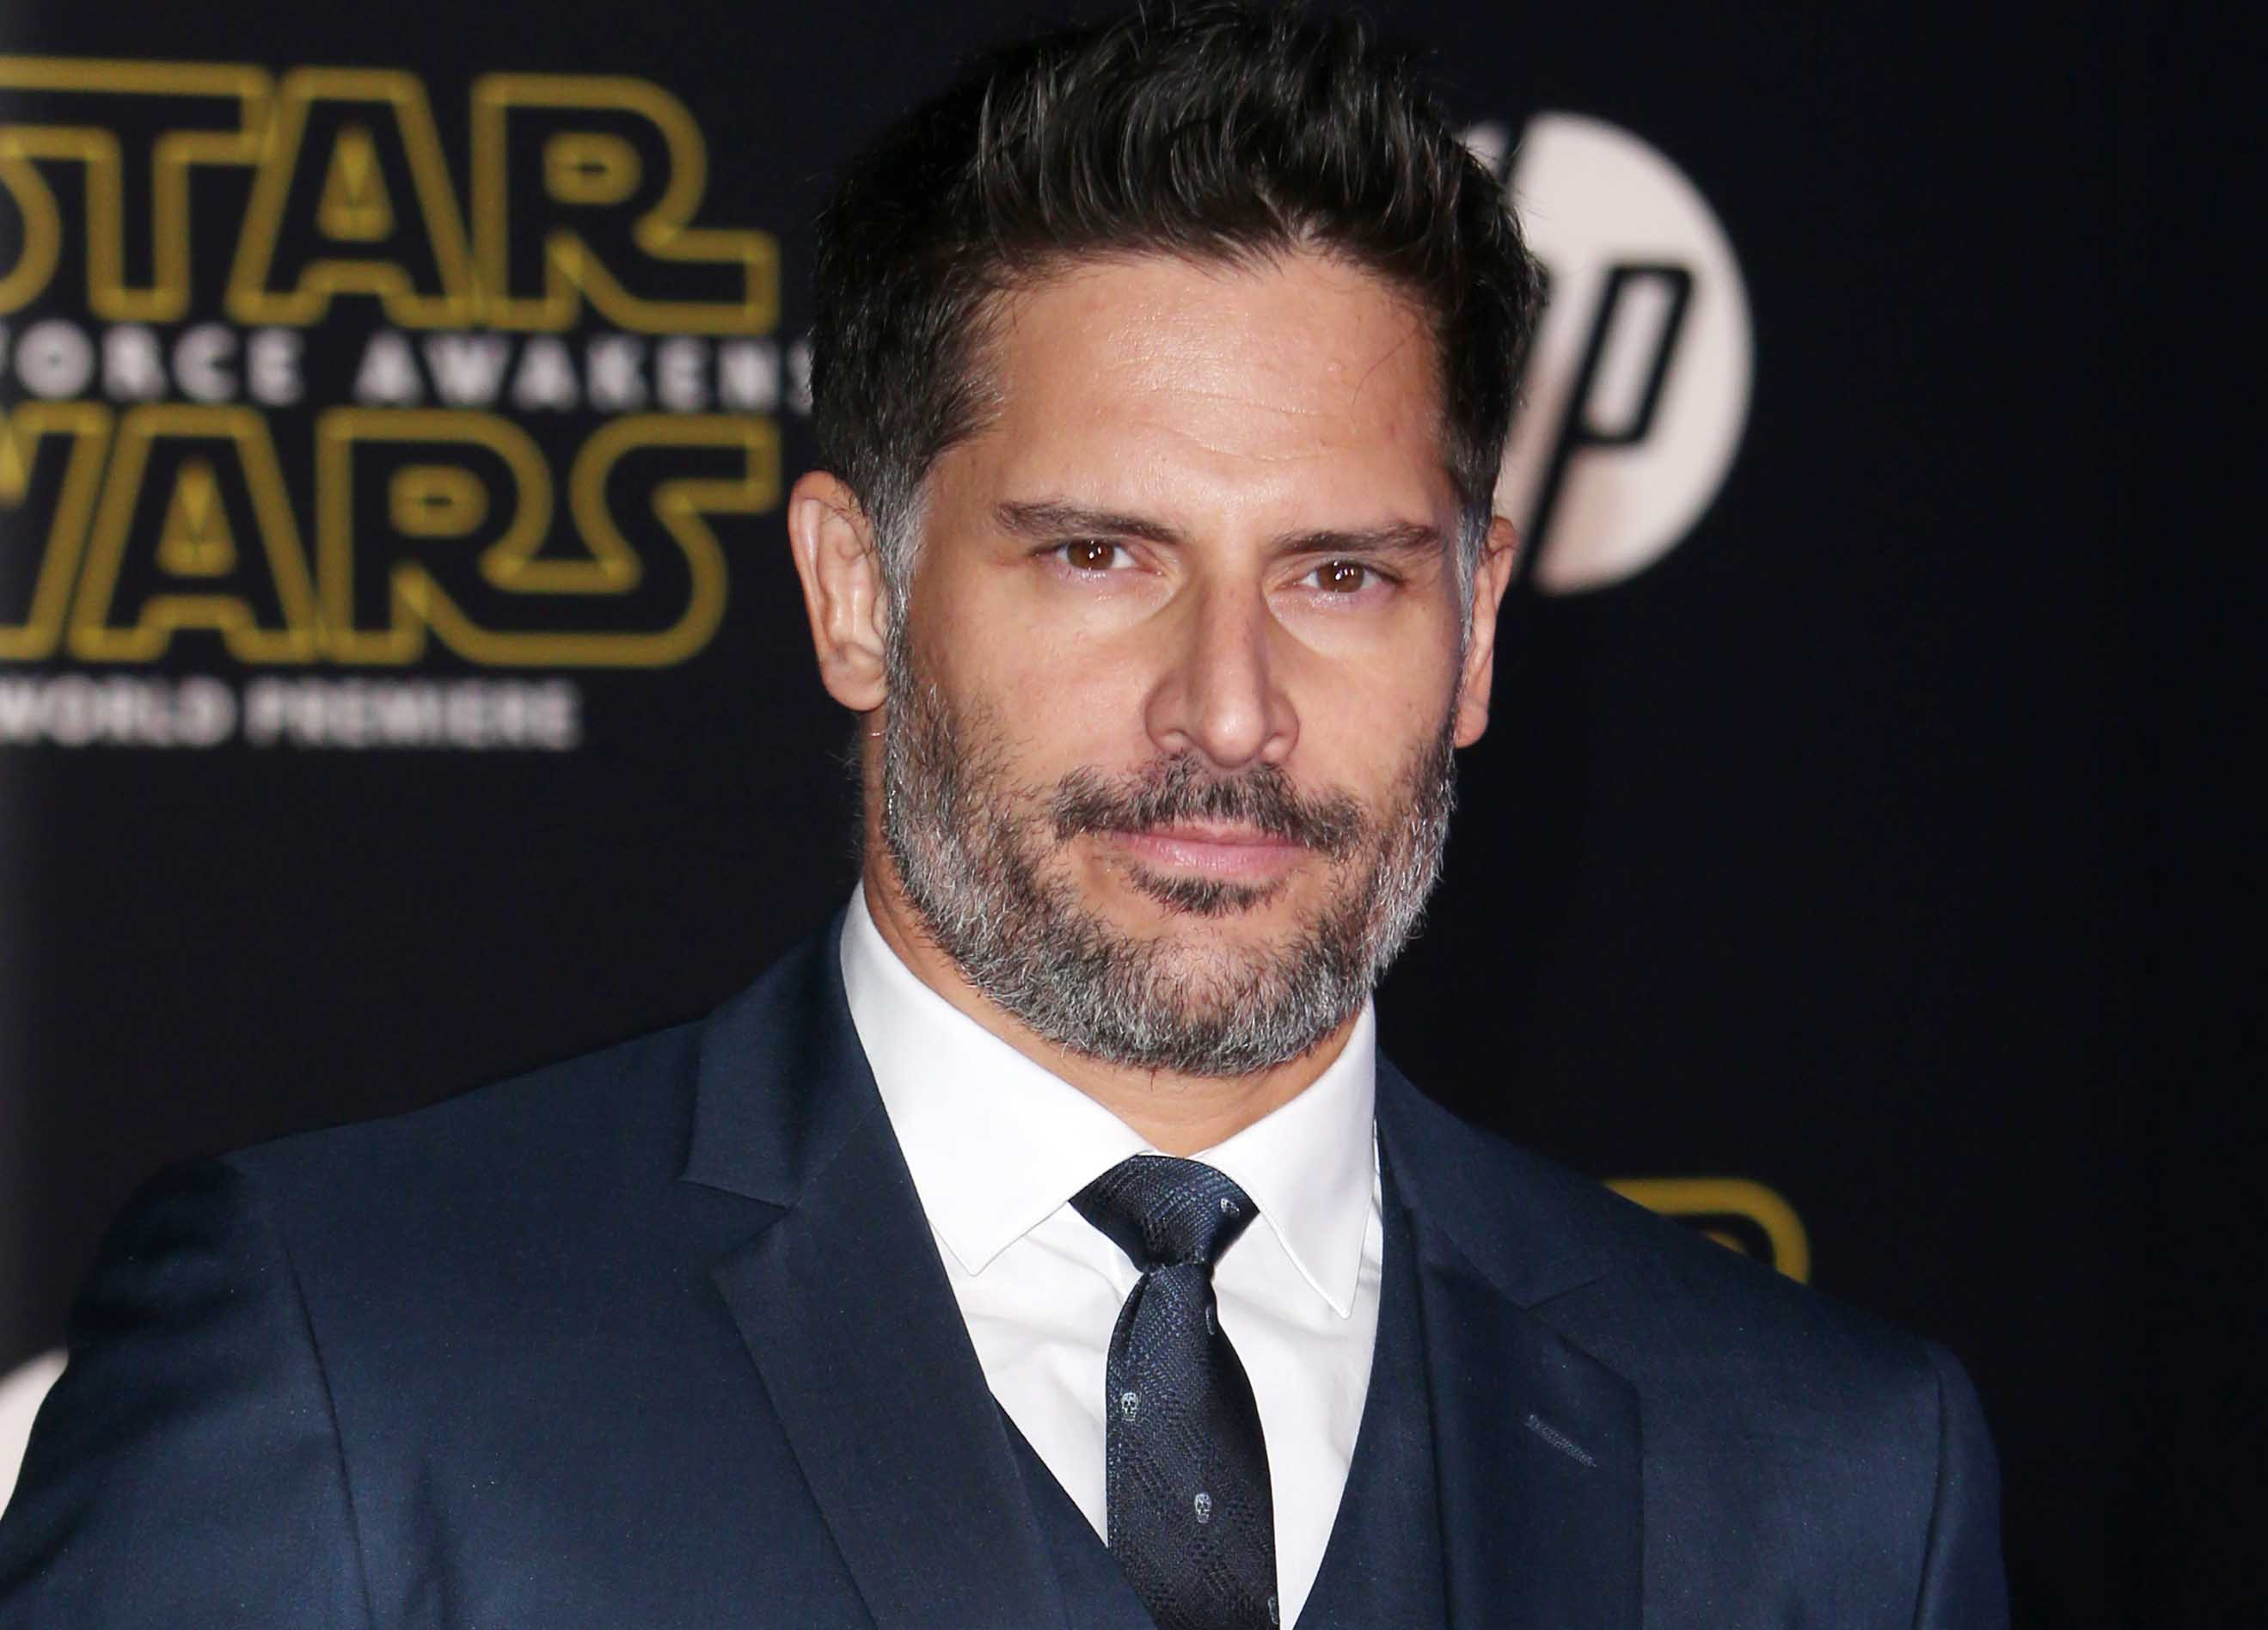 Joe Manganiello To Play Villain Deathstroke In Ben Affleck's 'Batman' Movie